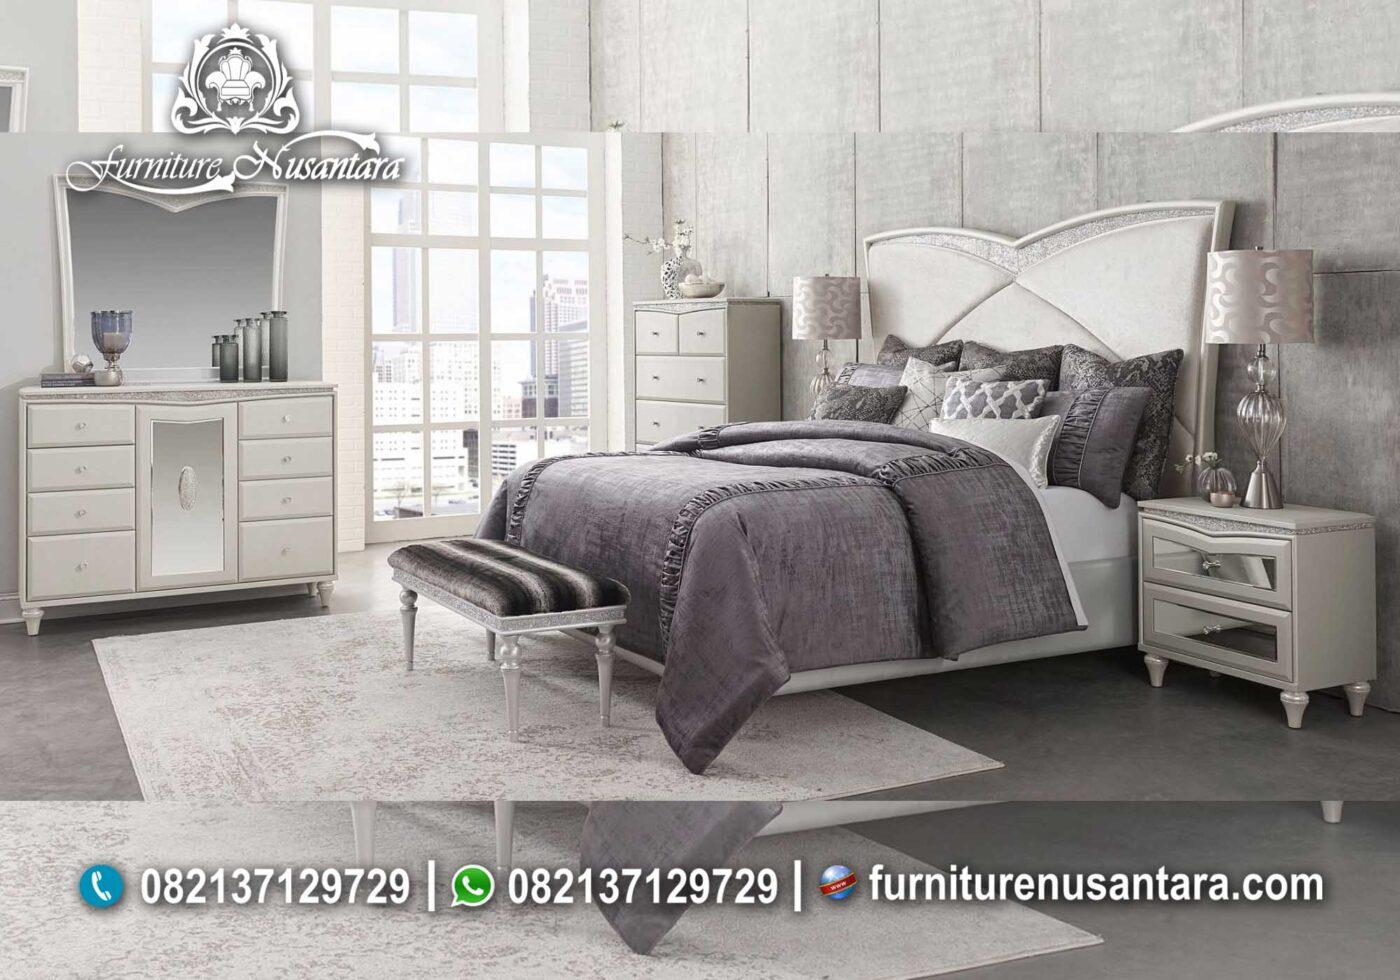 Desain Kamar Tidur Minimalis KS-21, Furniture Nusantara